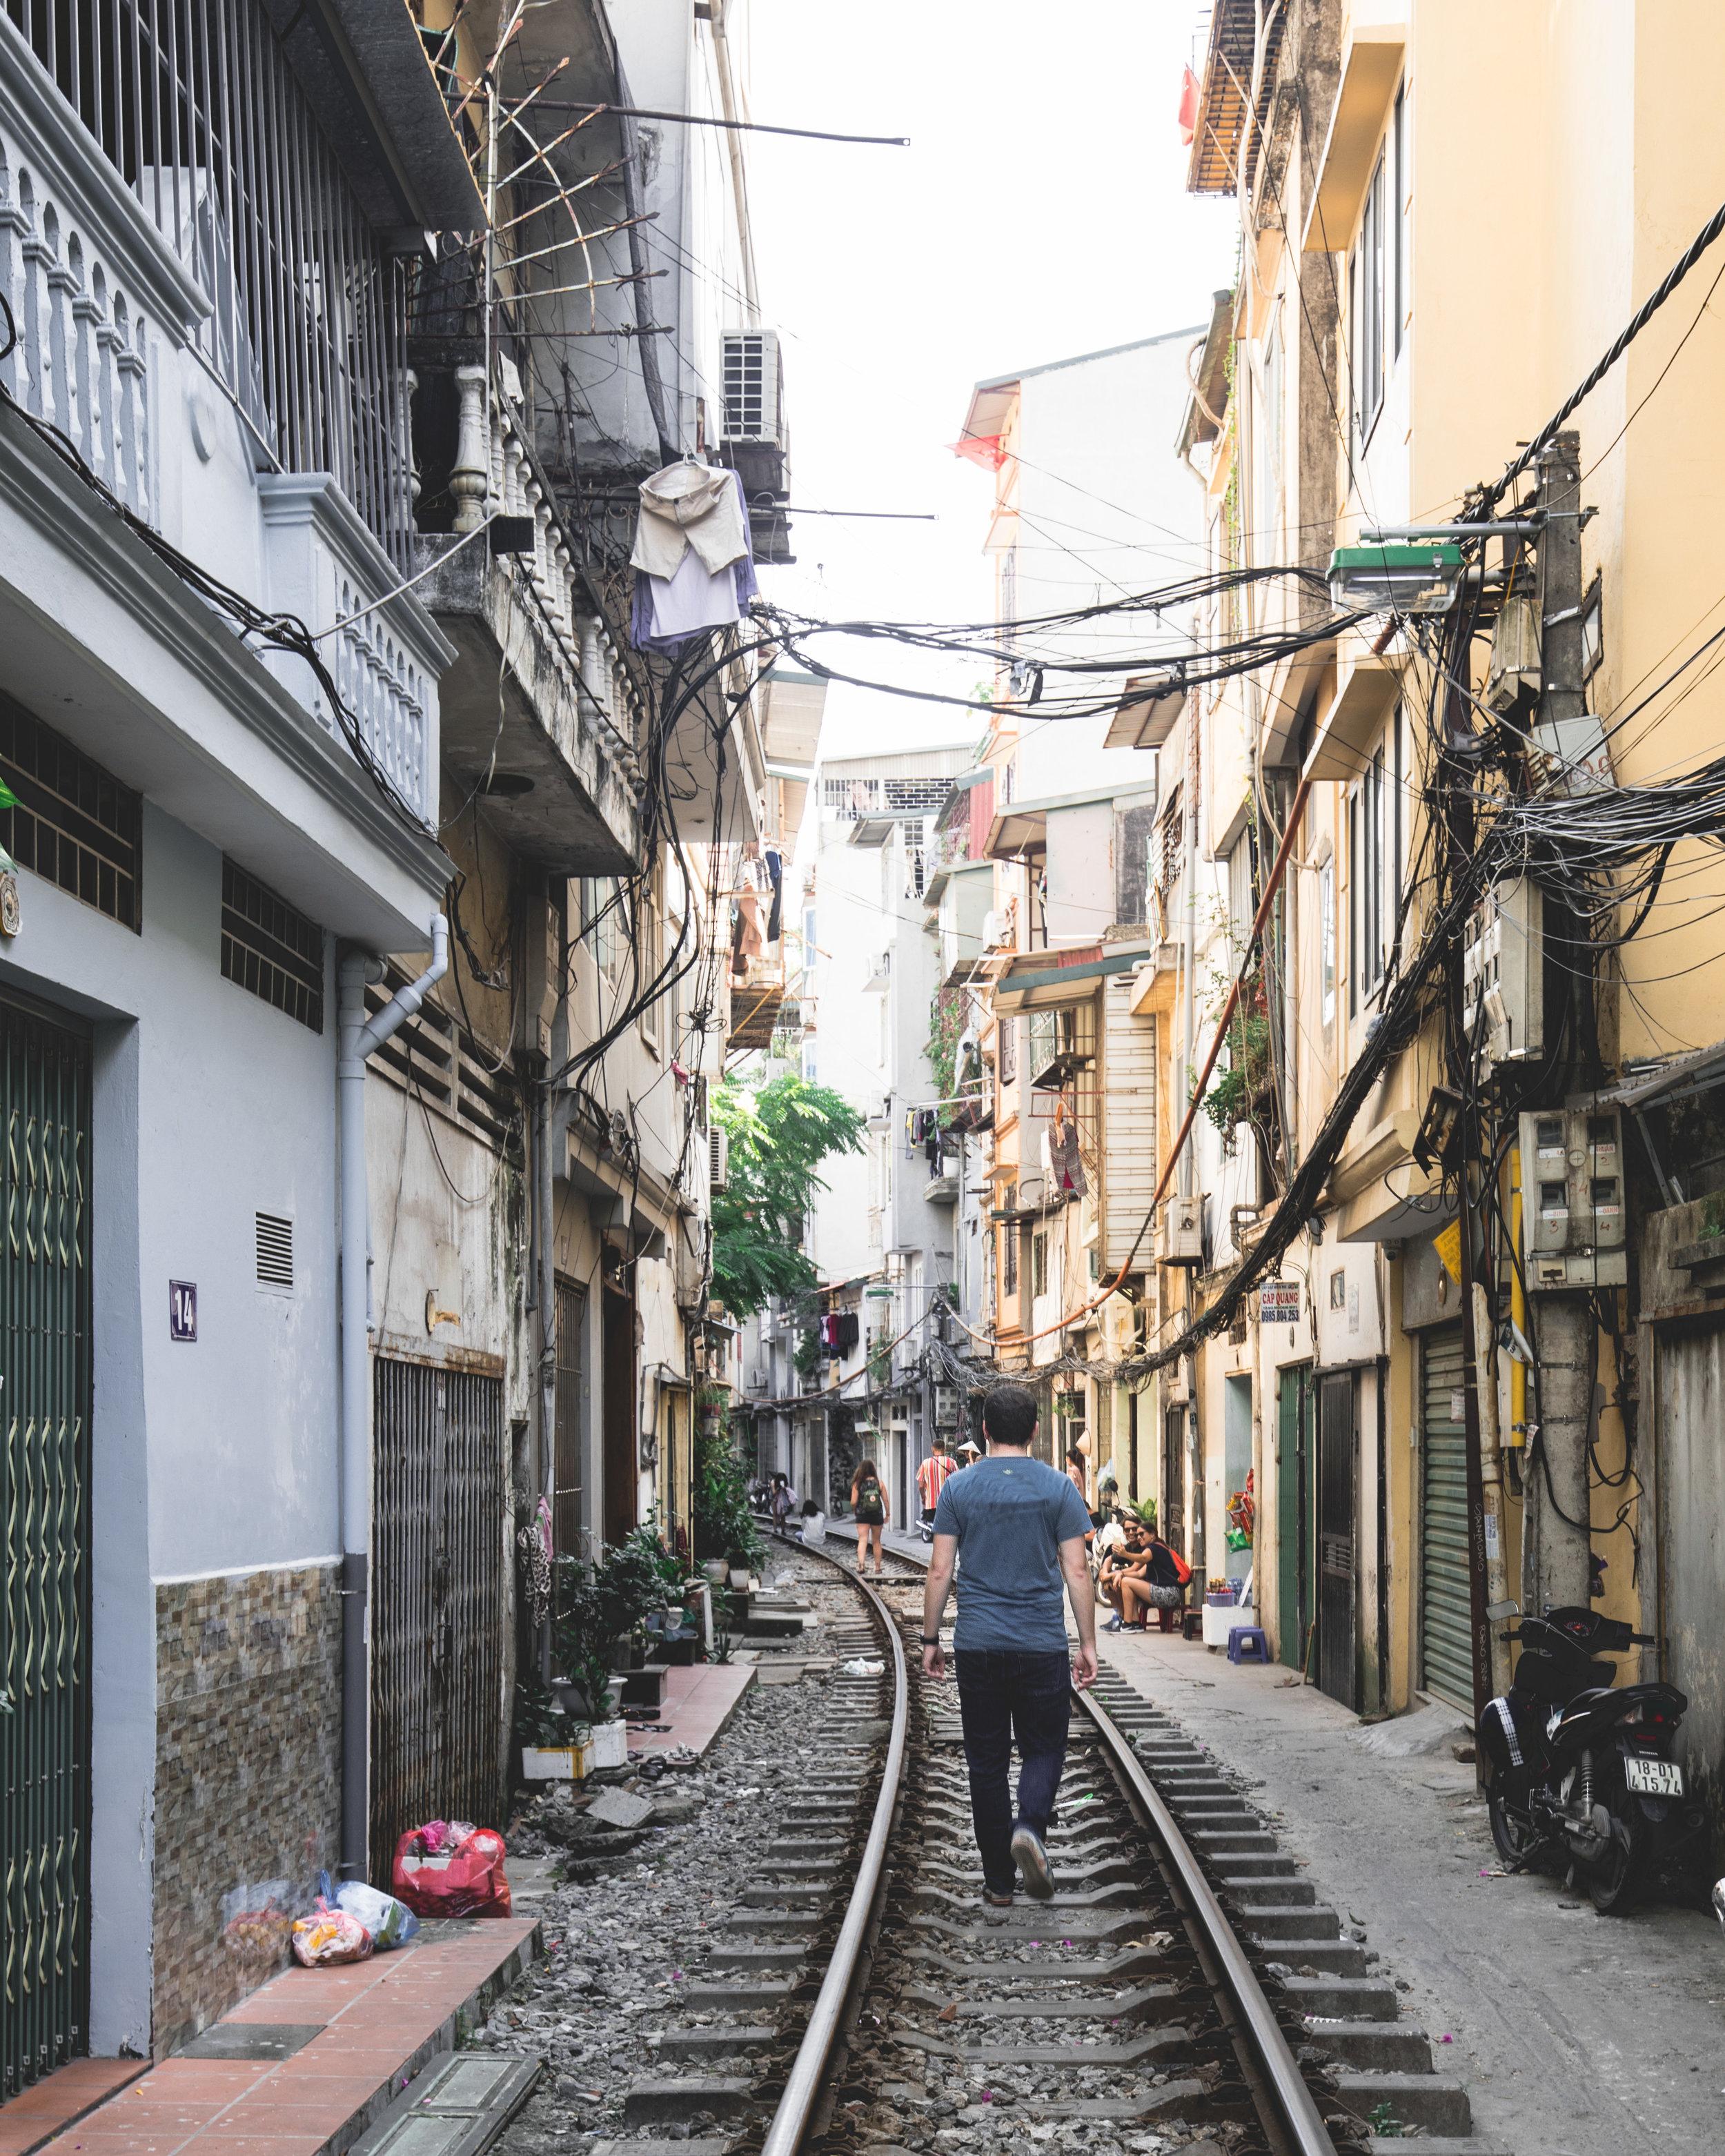 How to get to Train Street Hanoi